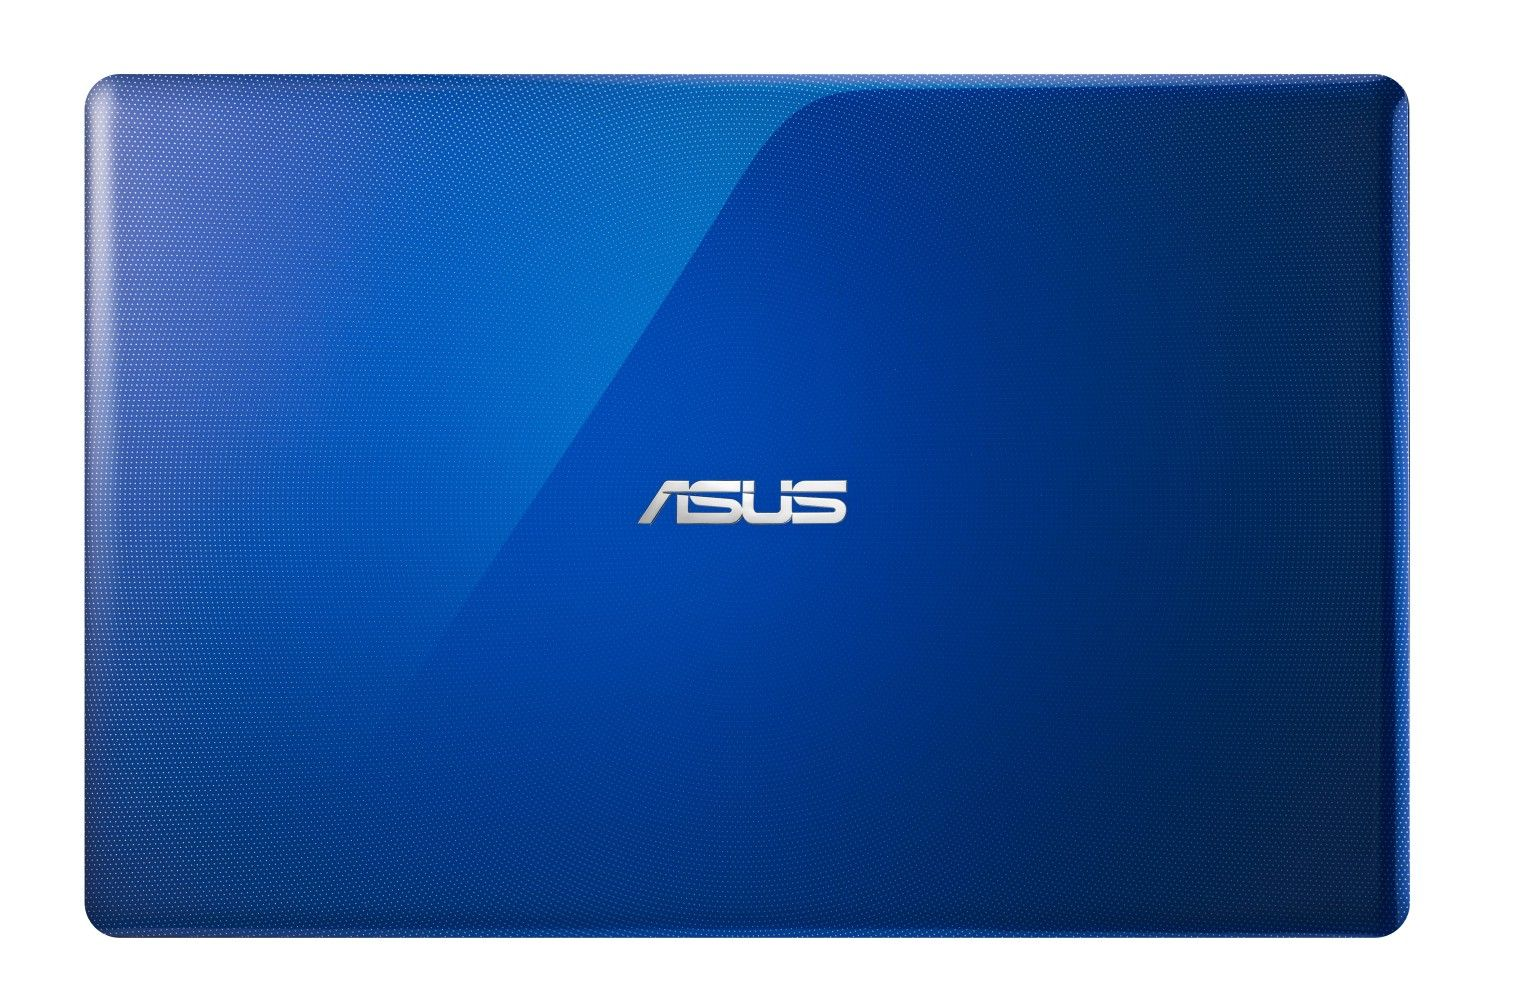 ASUS X550CA-XX201 - 3